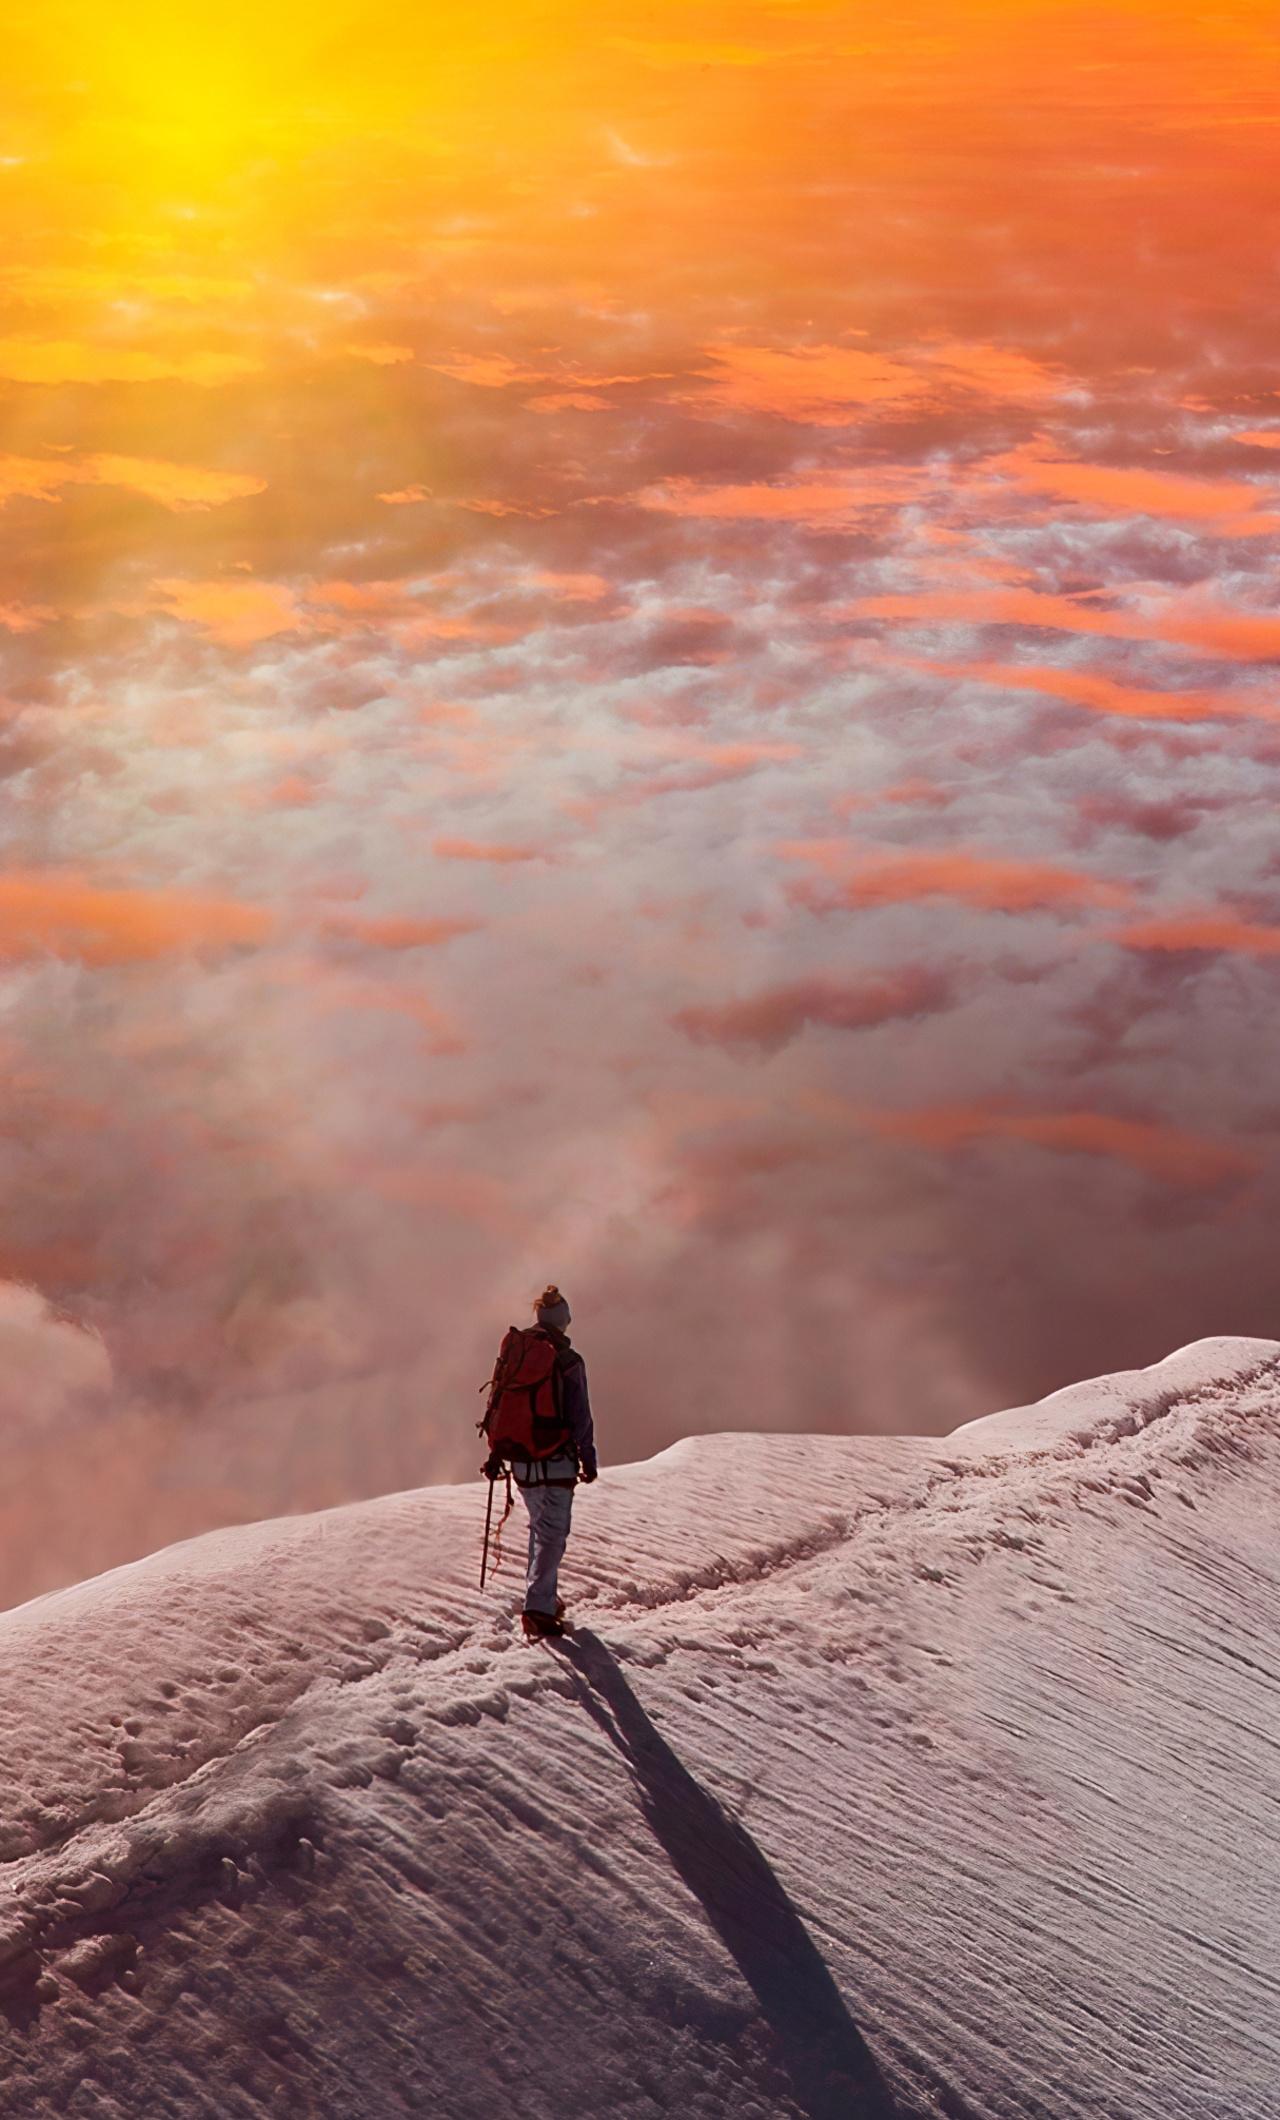 standing-at-snowy-peak-mountain-sunset-fz.jpg